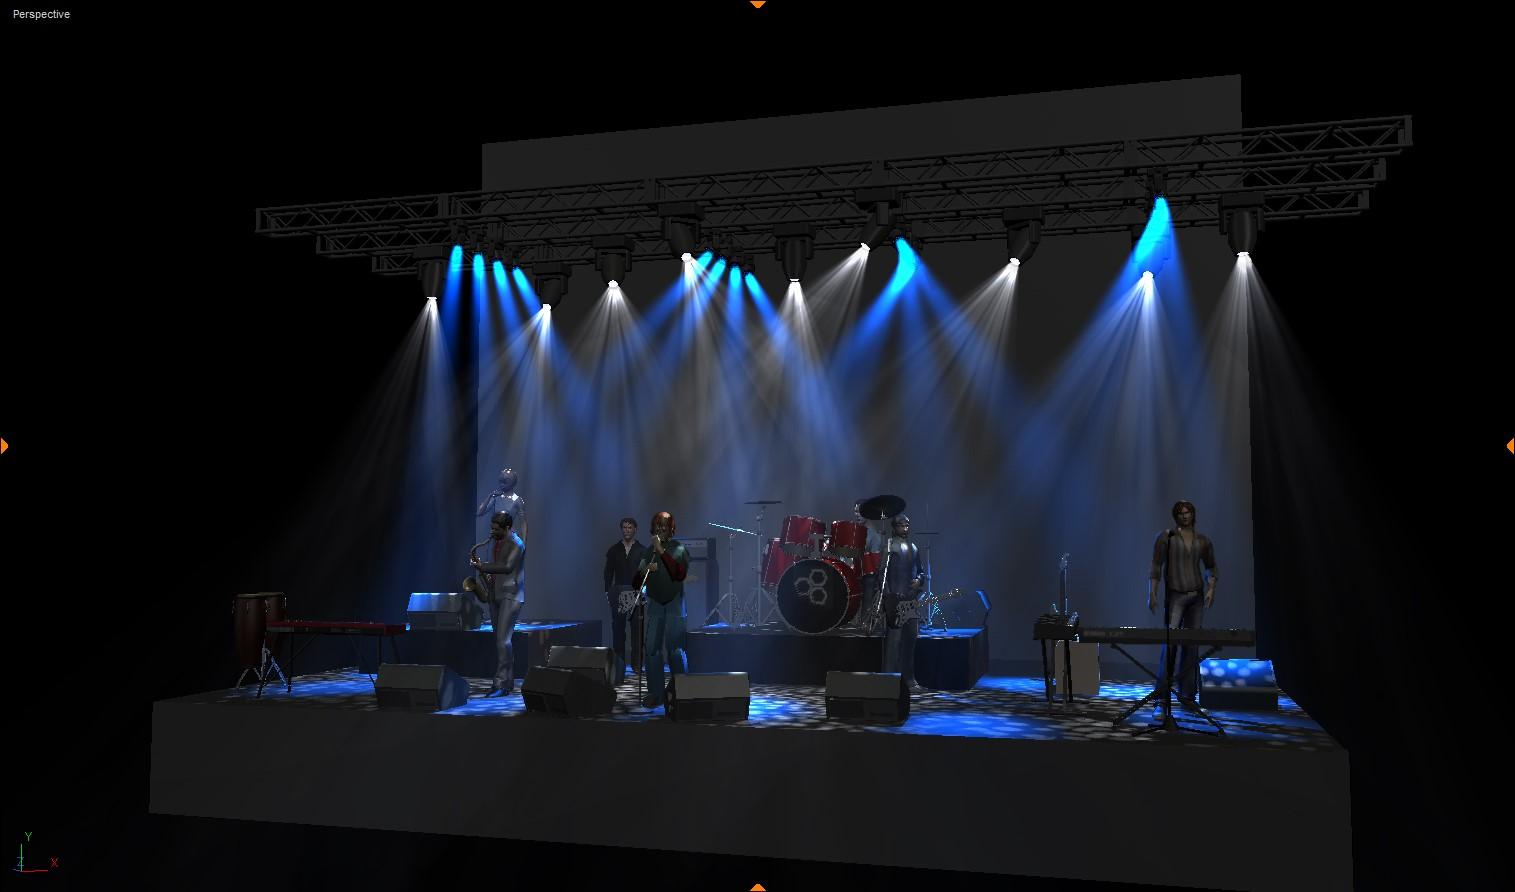 https://autocadtec.nl/wp-content/uploads/2021/02/Celebrating-the-music-of-Joe-Cocker-Club-r1.jpg